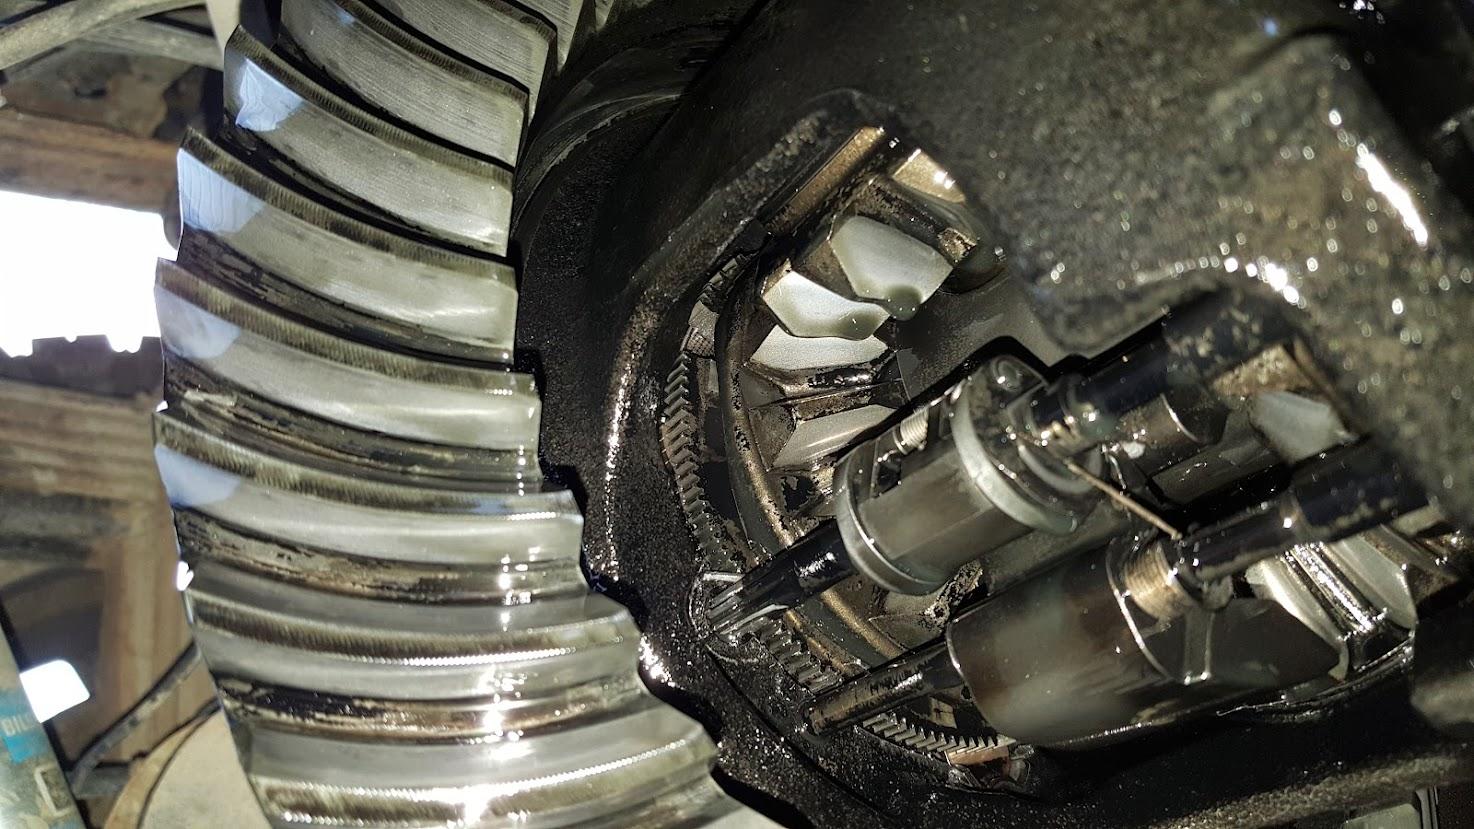 LMM: 07 5 lmm rear diff stuck locked in  found the cause